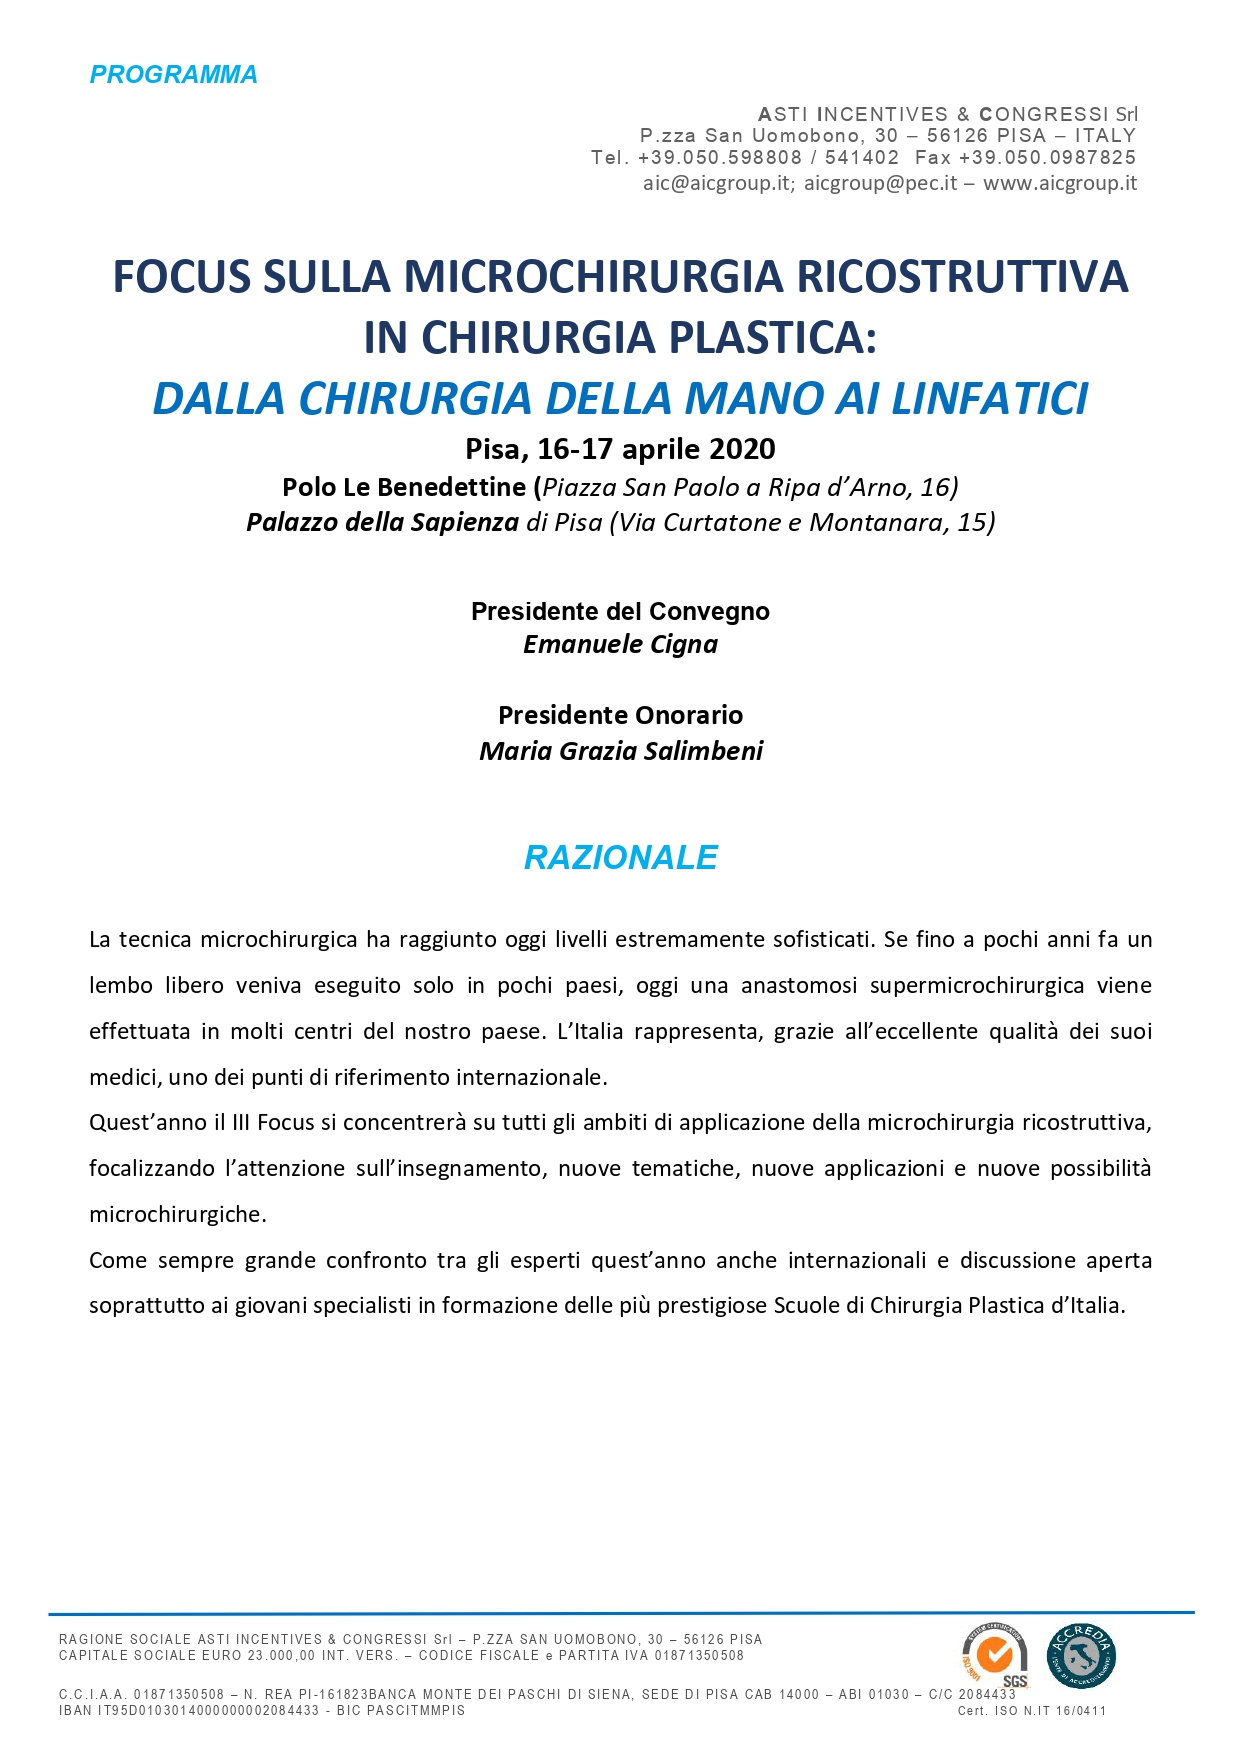 Progr_III Focus Microchirurgia 2020_page-0001